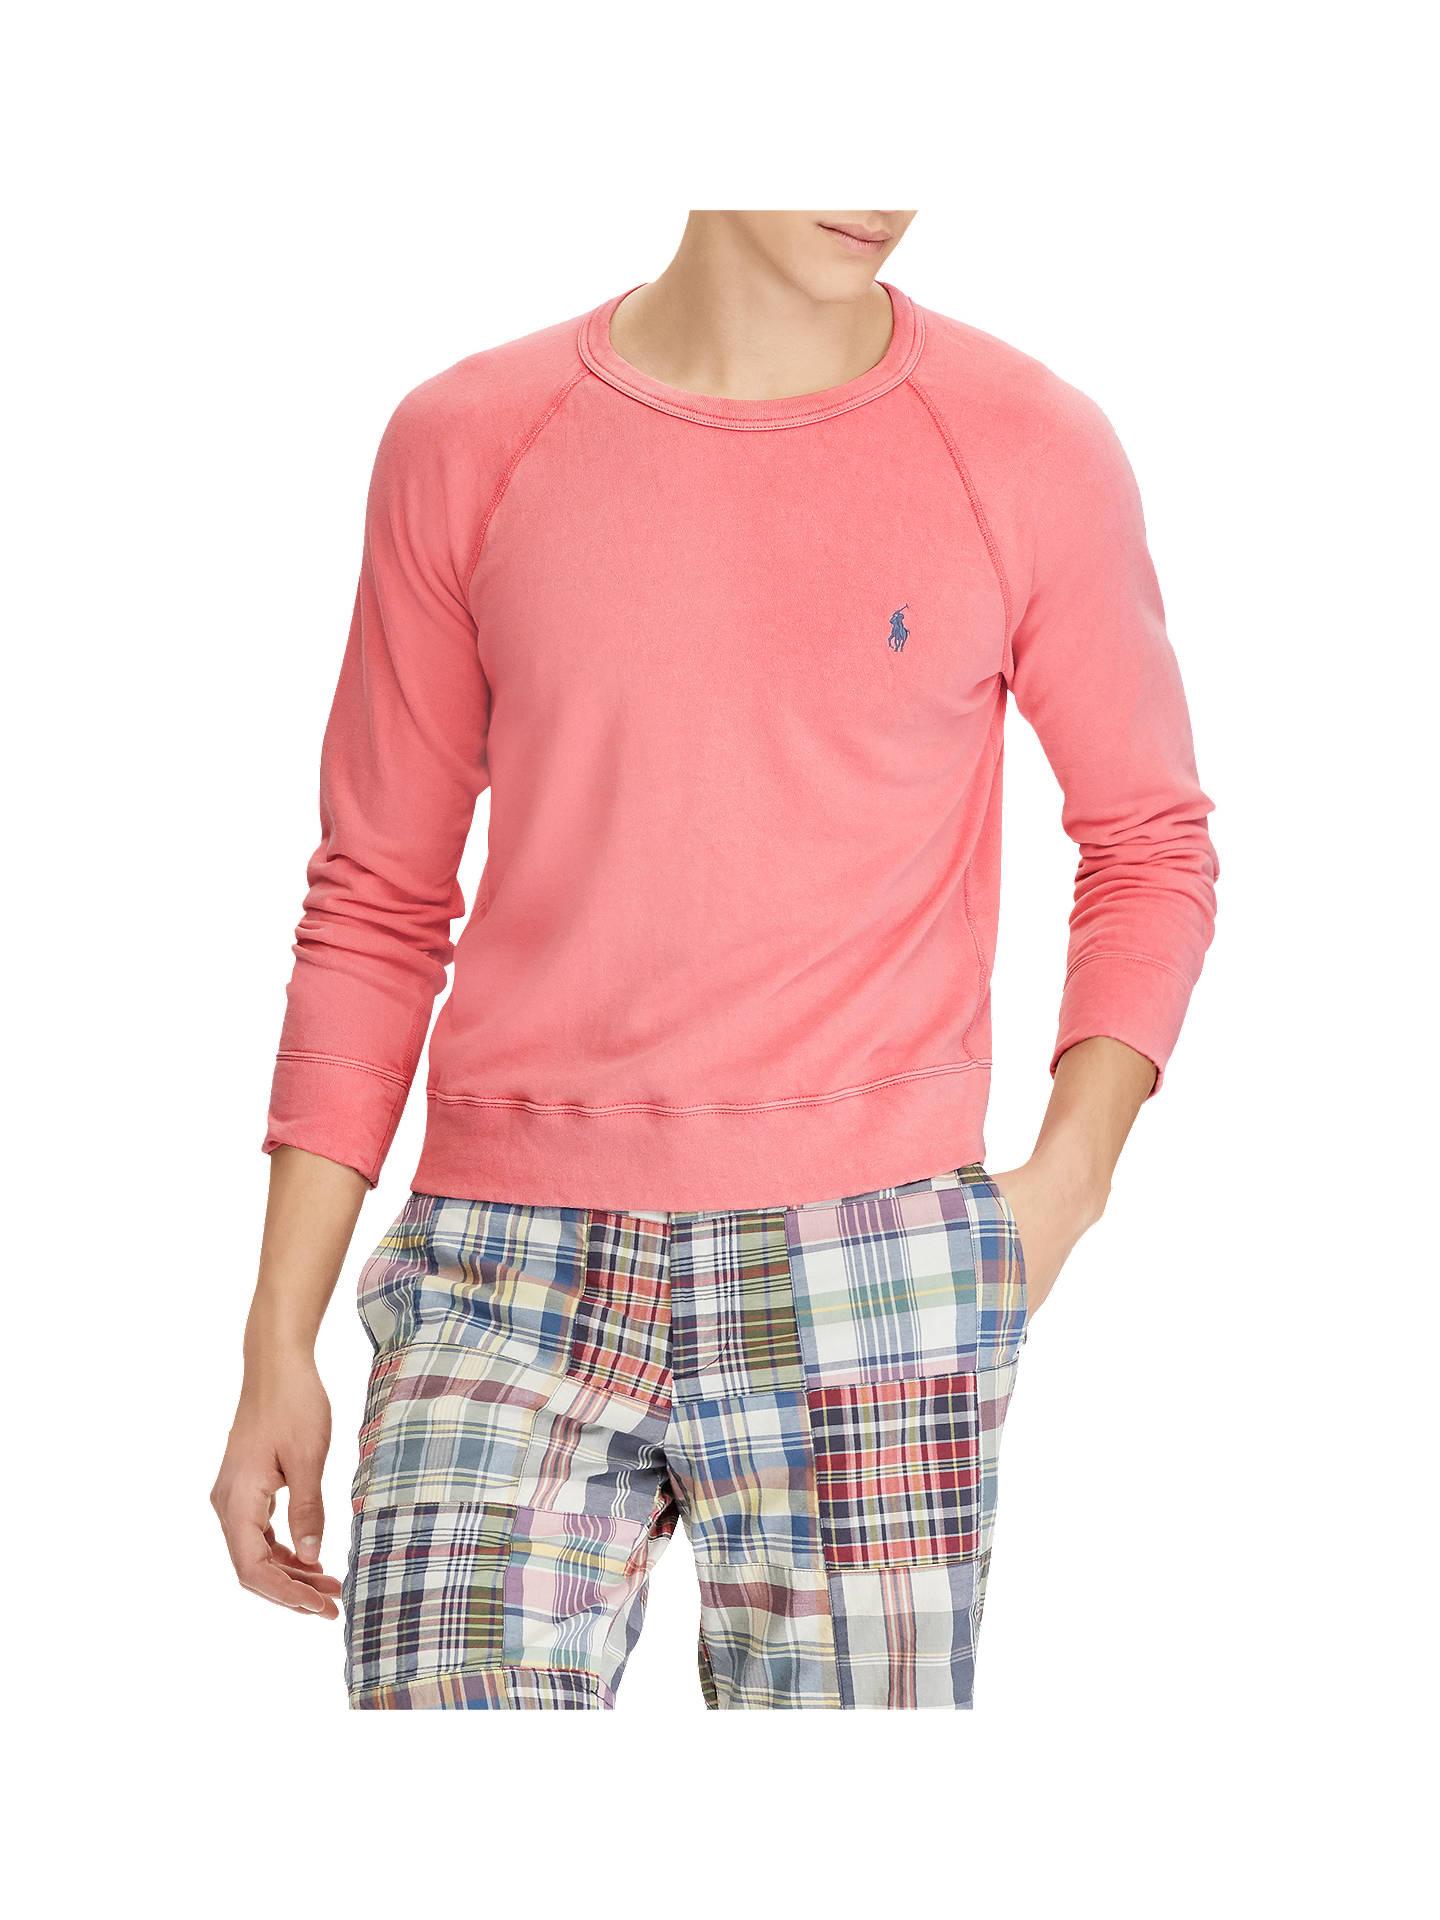 f20ed593b Polo Ralph Lauren Spa Terry Long Sleeve Crew Neck Sweatshirt ...